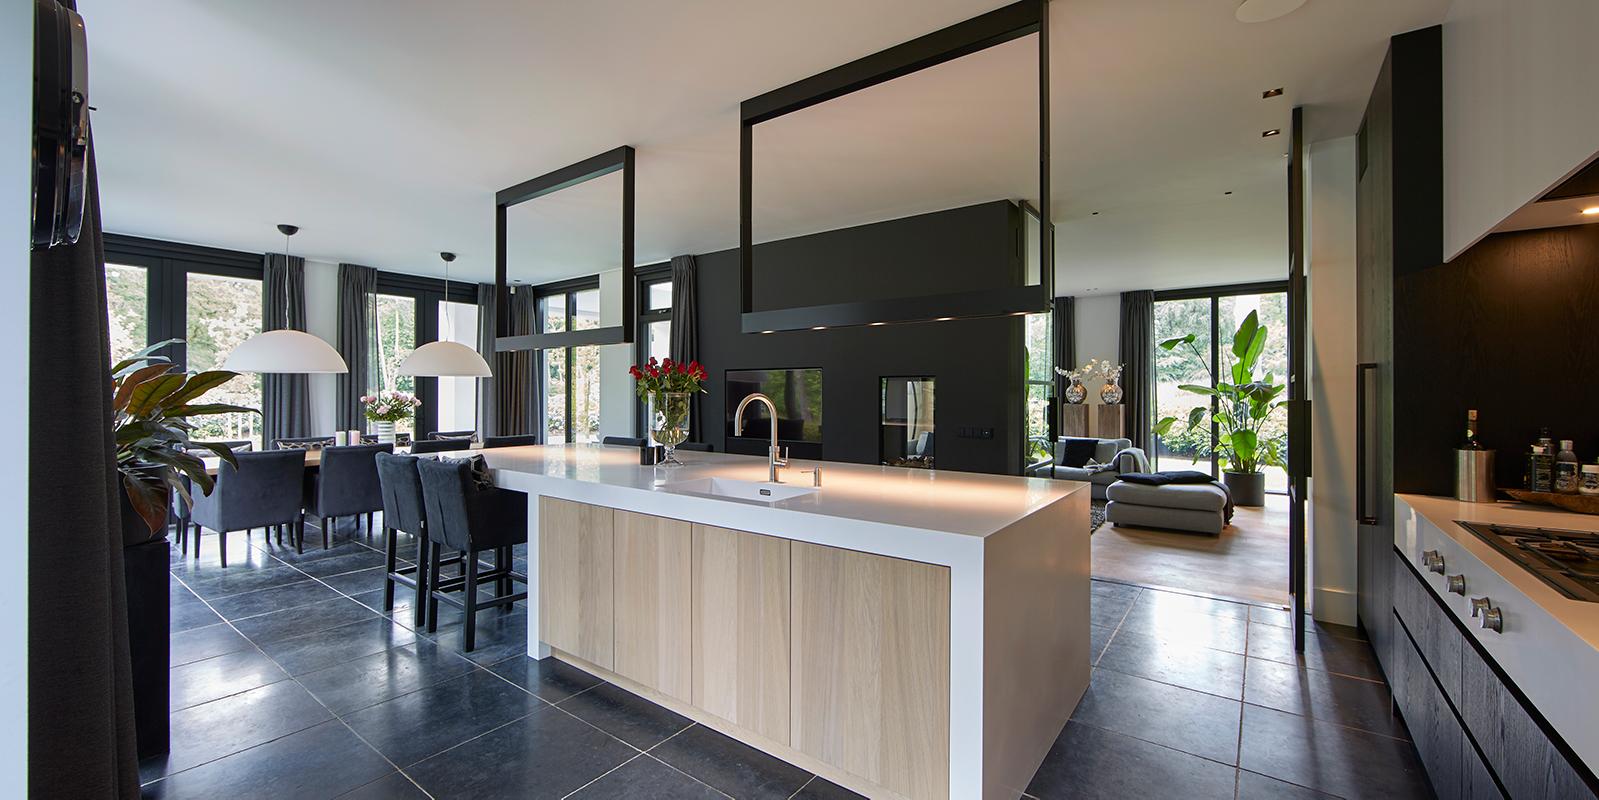 moderne keukenapparatuur, gaggenau, keukens